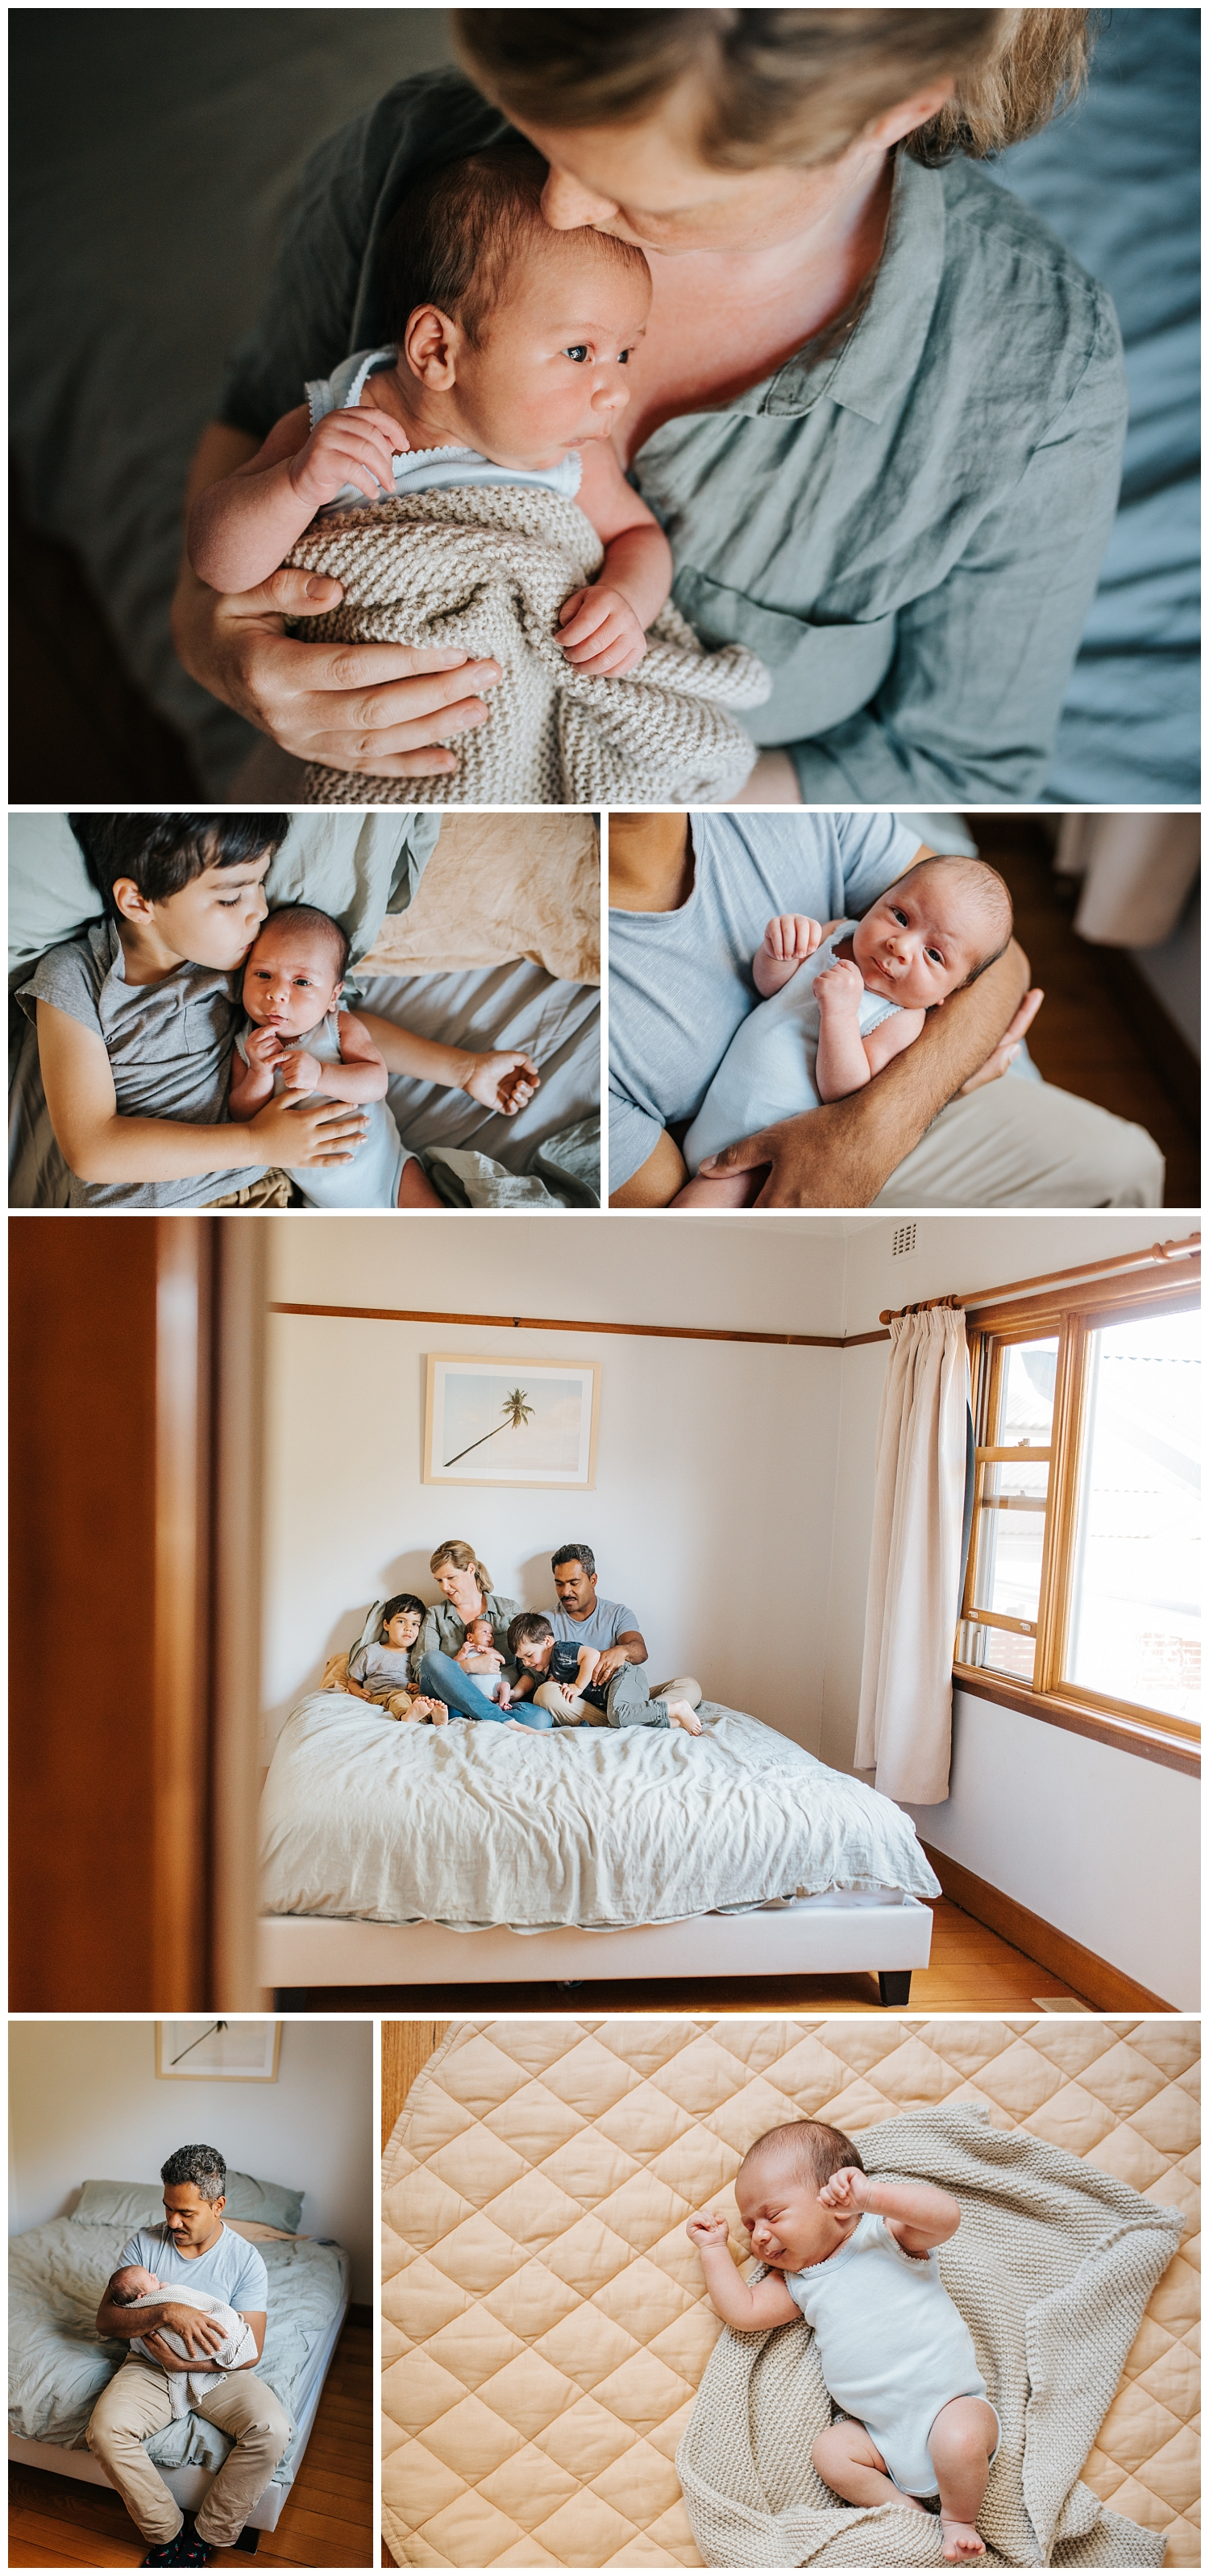 australian birth stories newborn photo session - Jess Worrall Photography